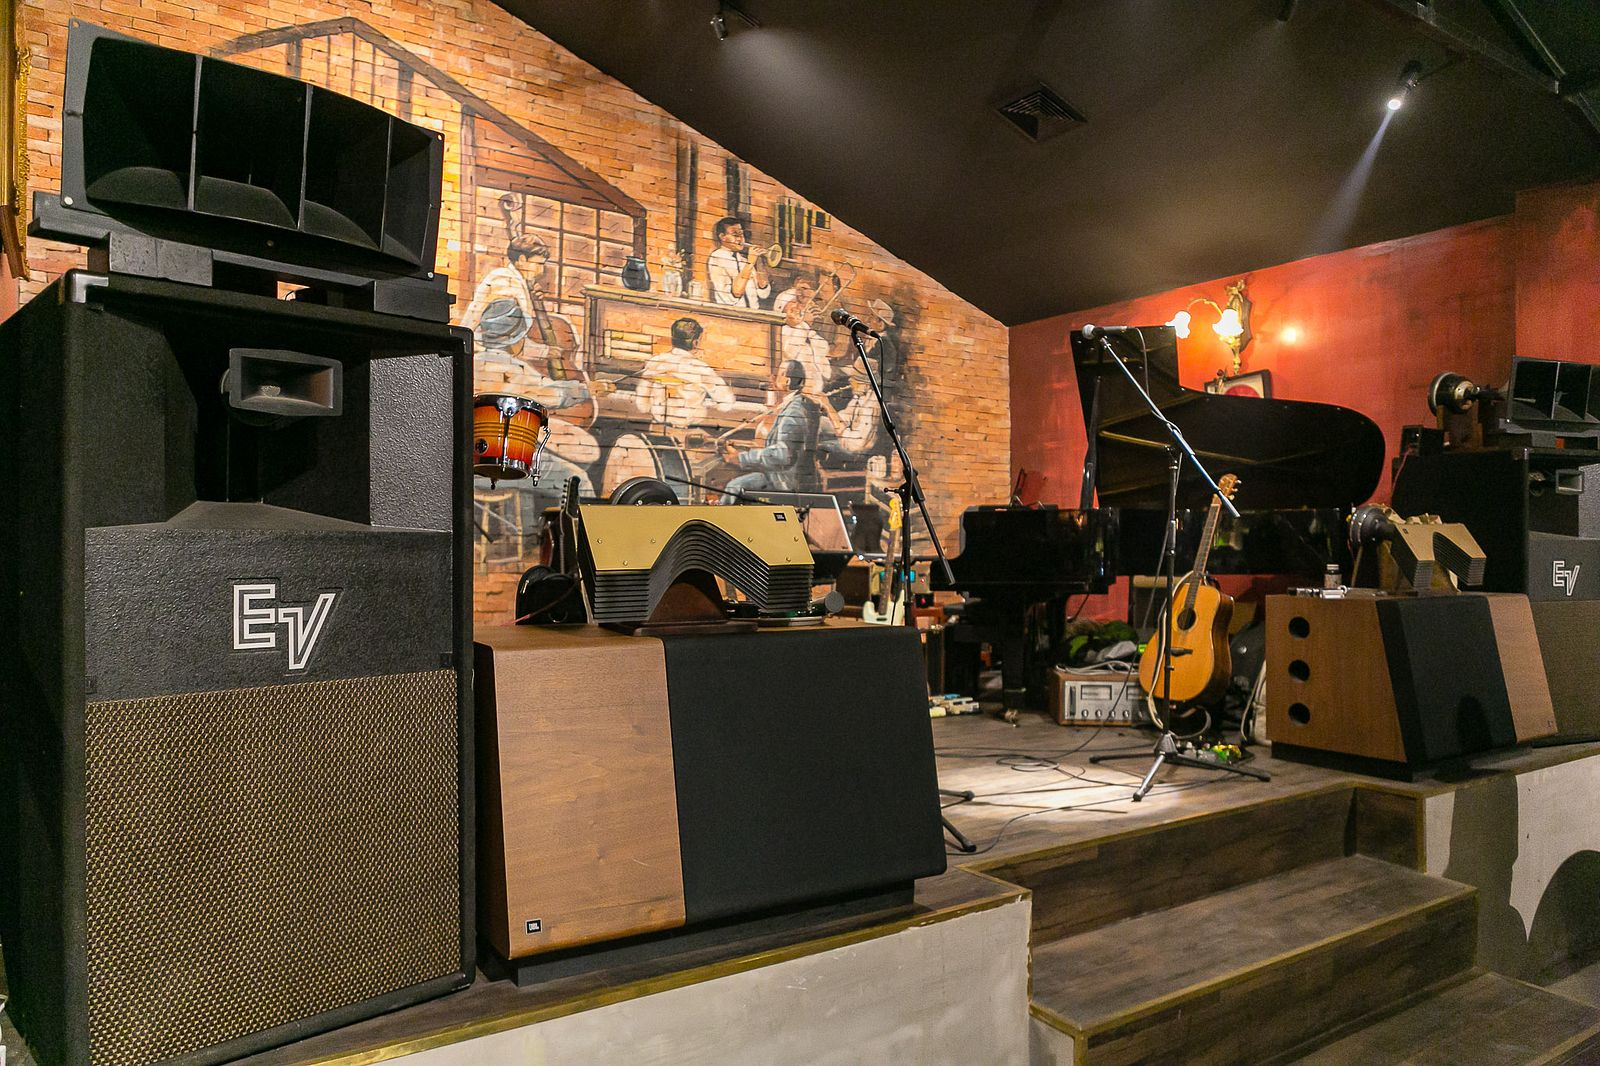 Remi: How a Group of Audiophile Friends Built a Premier Place to Promote Live Music |  Saigoneer